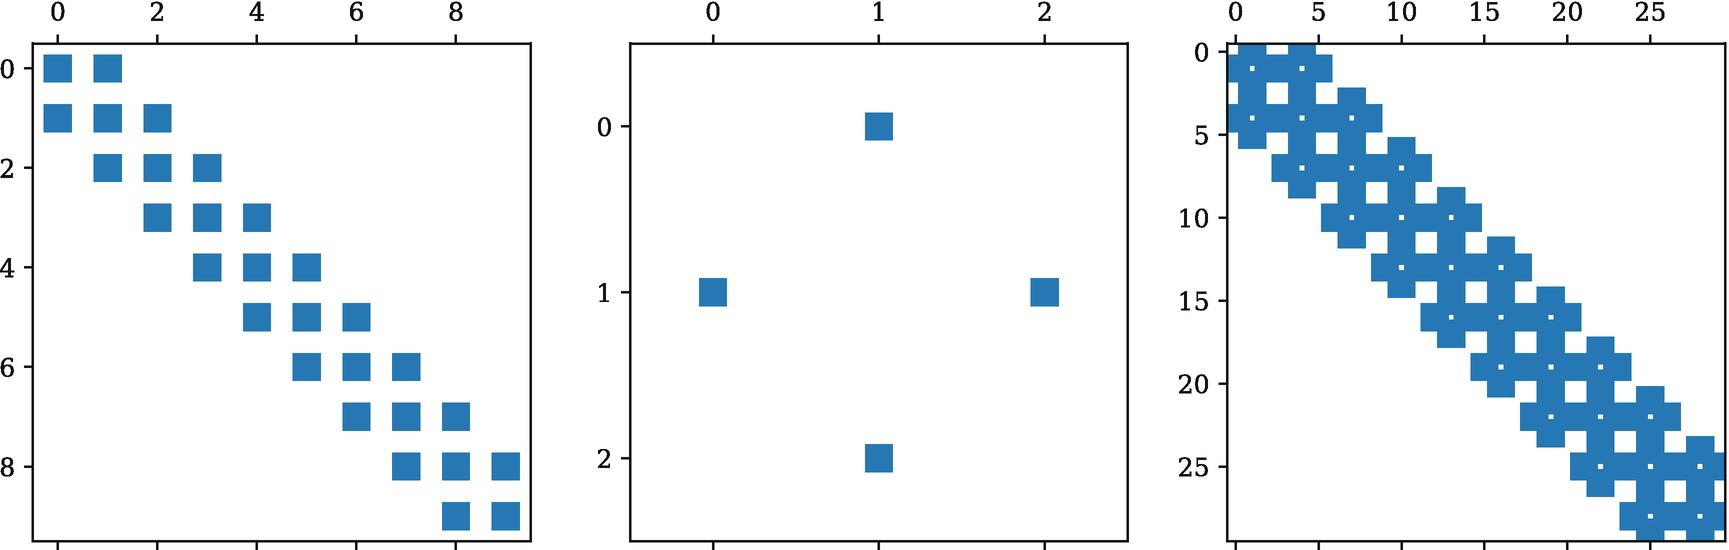 Sparse Matrices and Graphs | SpringerLink